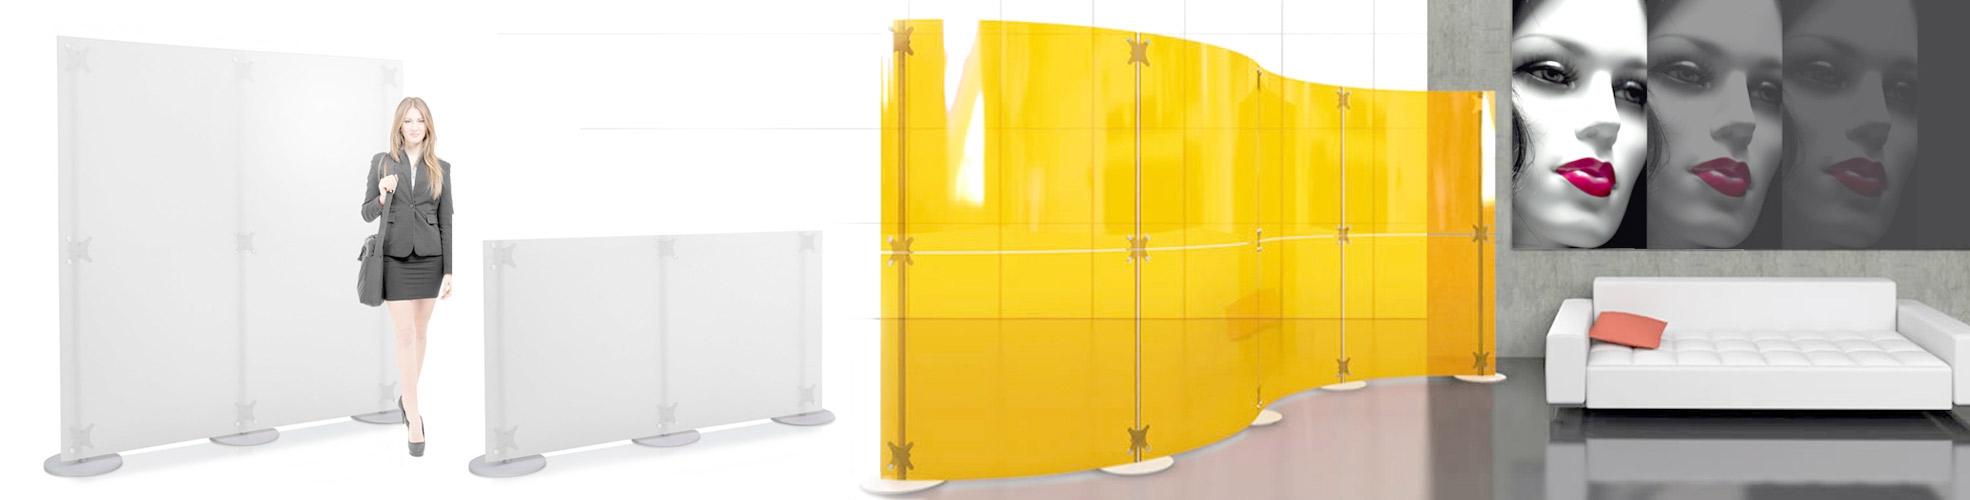 Divisori In Plexiglass Per Esterni publibeta® | pareti e pannelli divisorii - per uffici ed